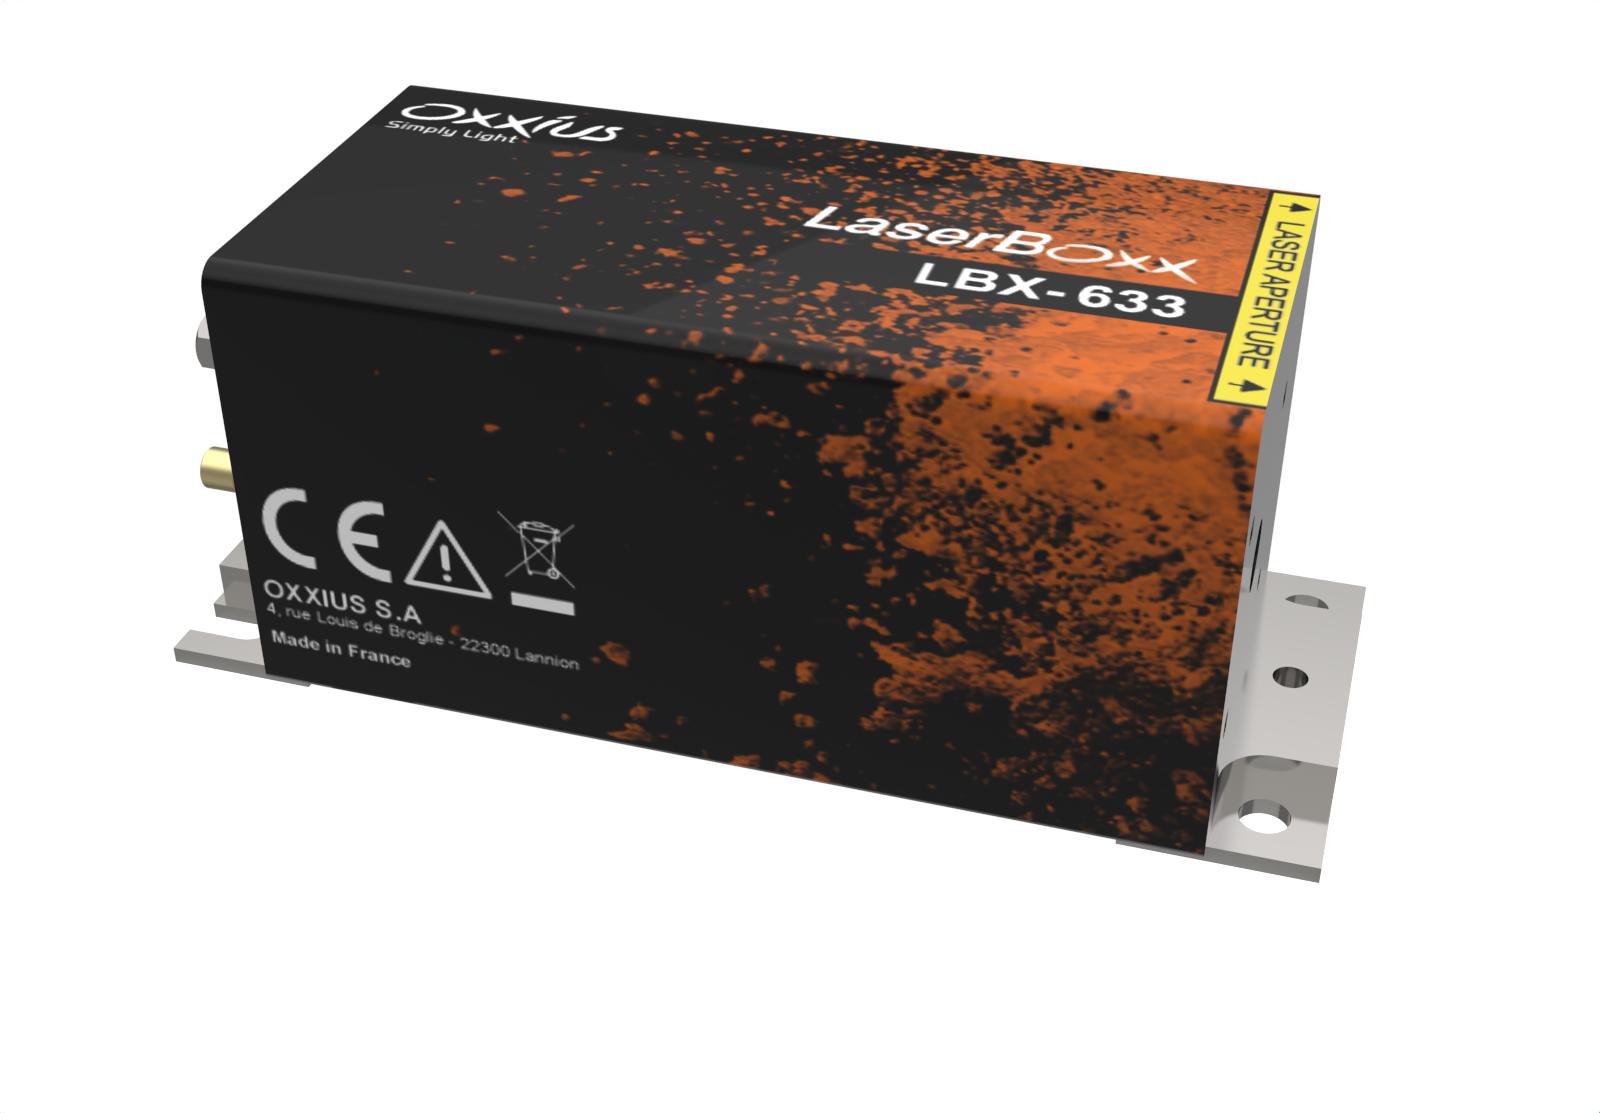 LBX-633-100-CSB